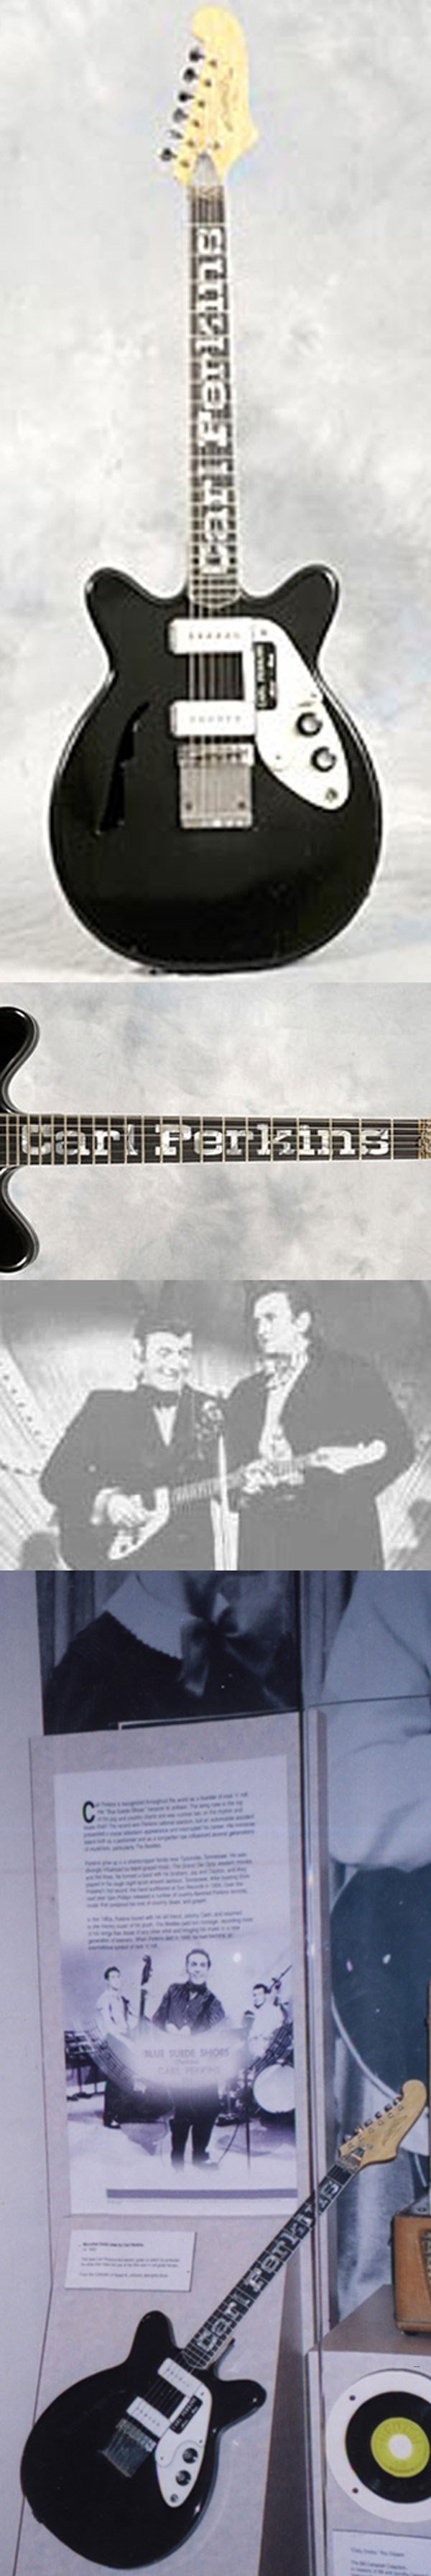 72 - Carl Perkins owned and played guitar